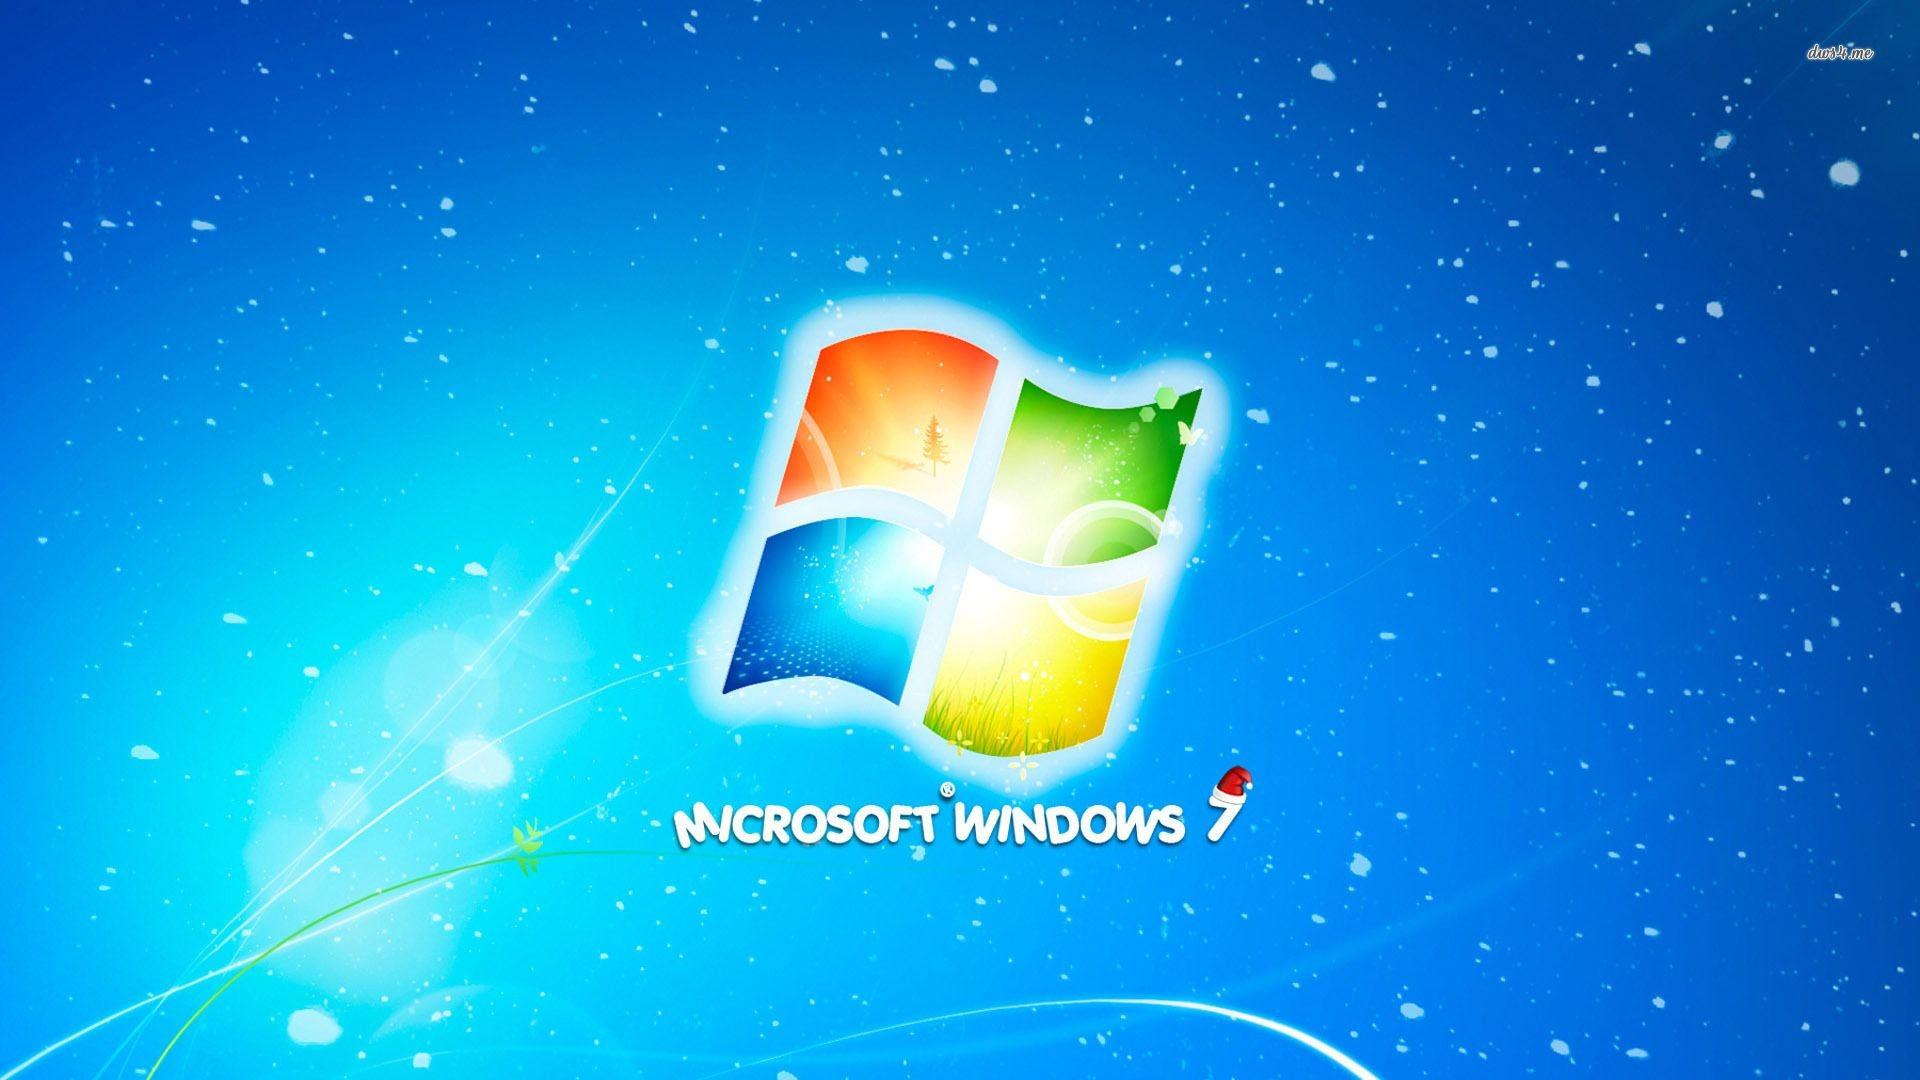 Microsoft Windows 7 Merry Christmas wallpaper – Computer .